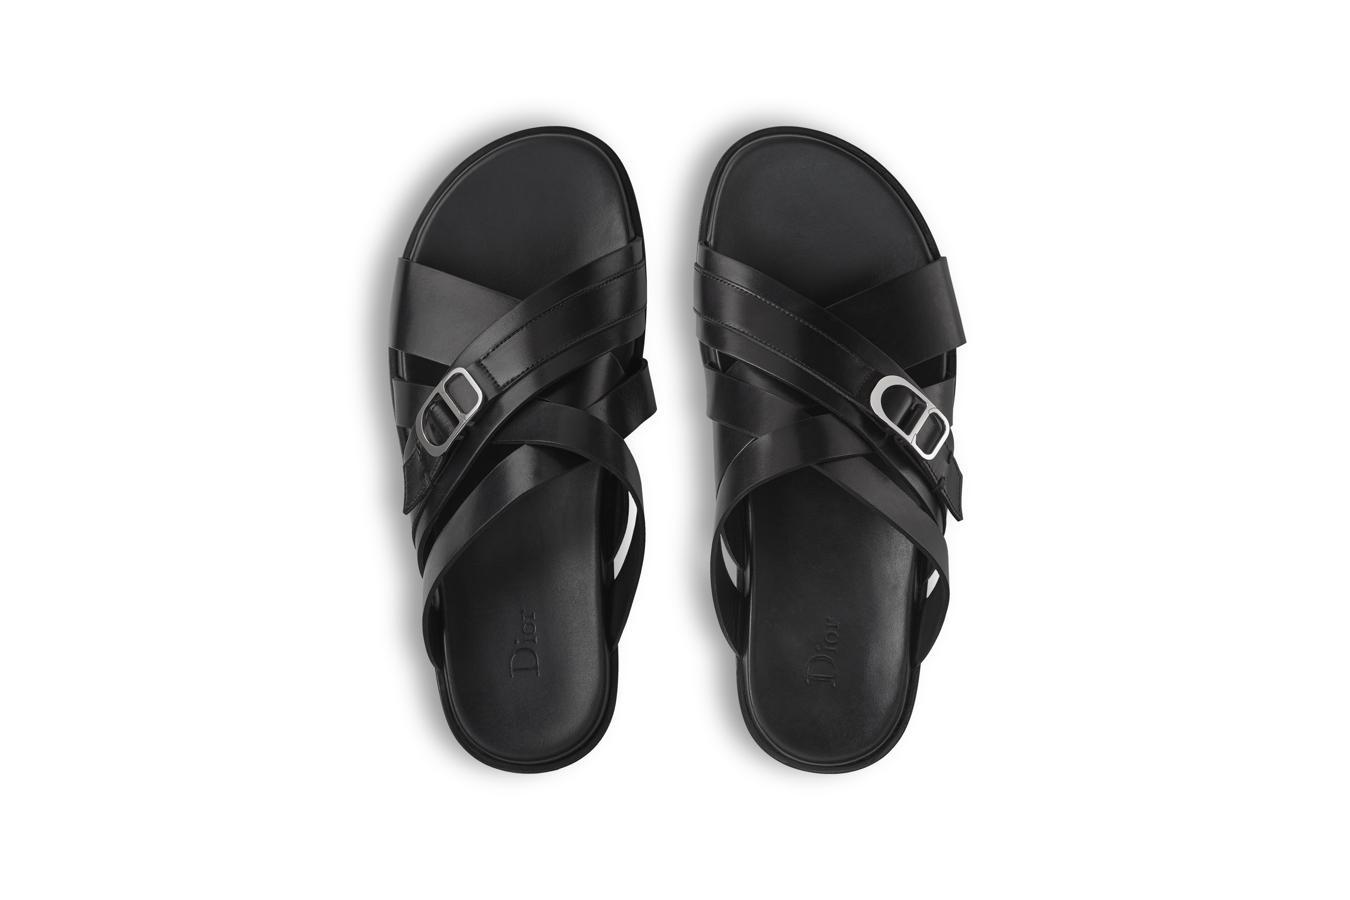 Sandalias Este Para Verano Sandalias Este 10 Sandalias Para Para 10 Verano 10 rxBtQdshC